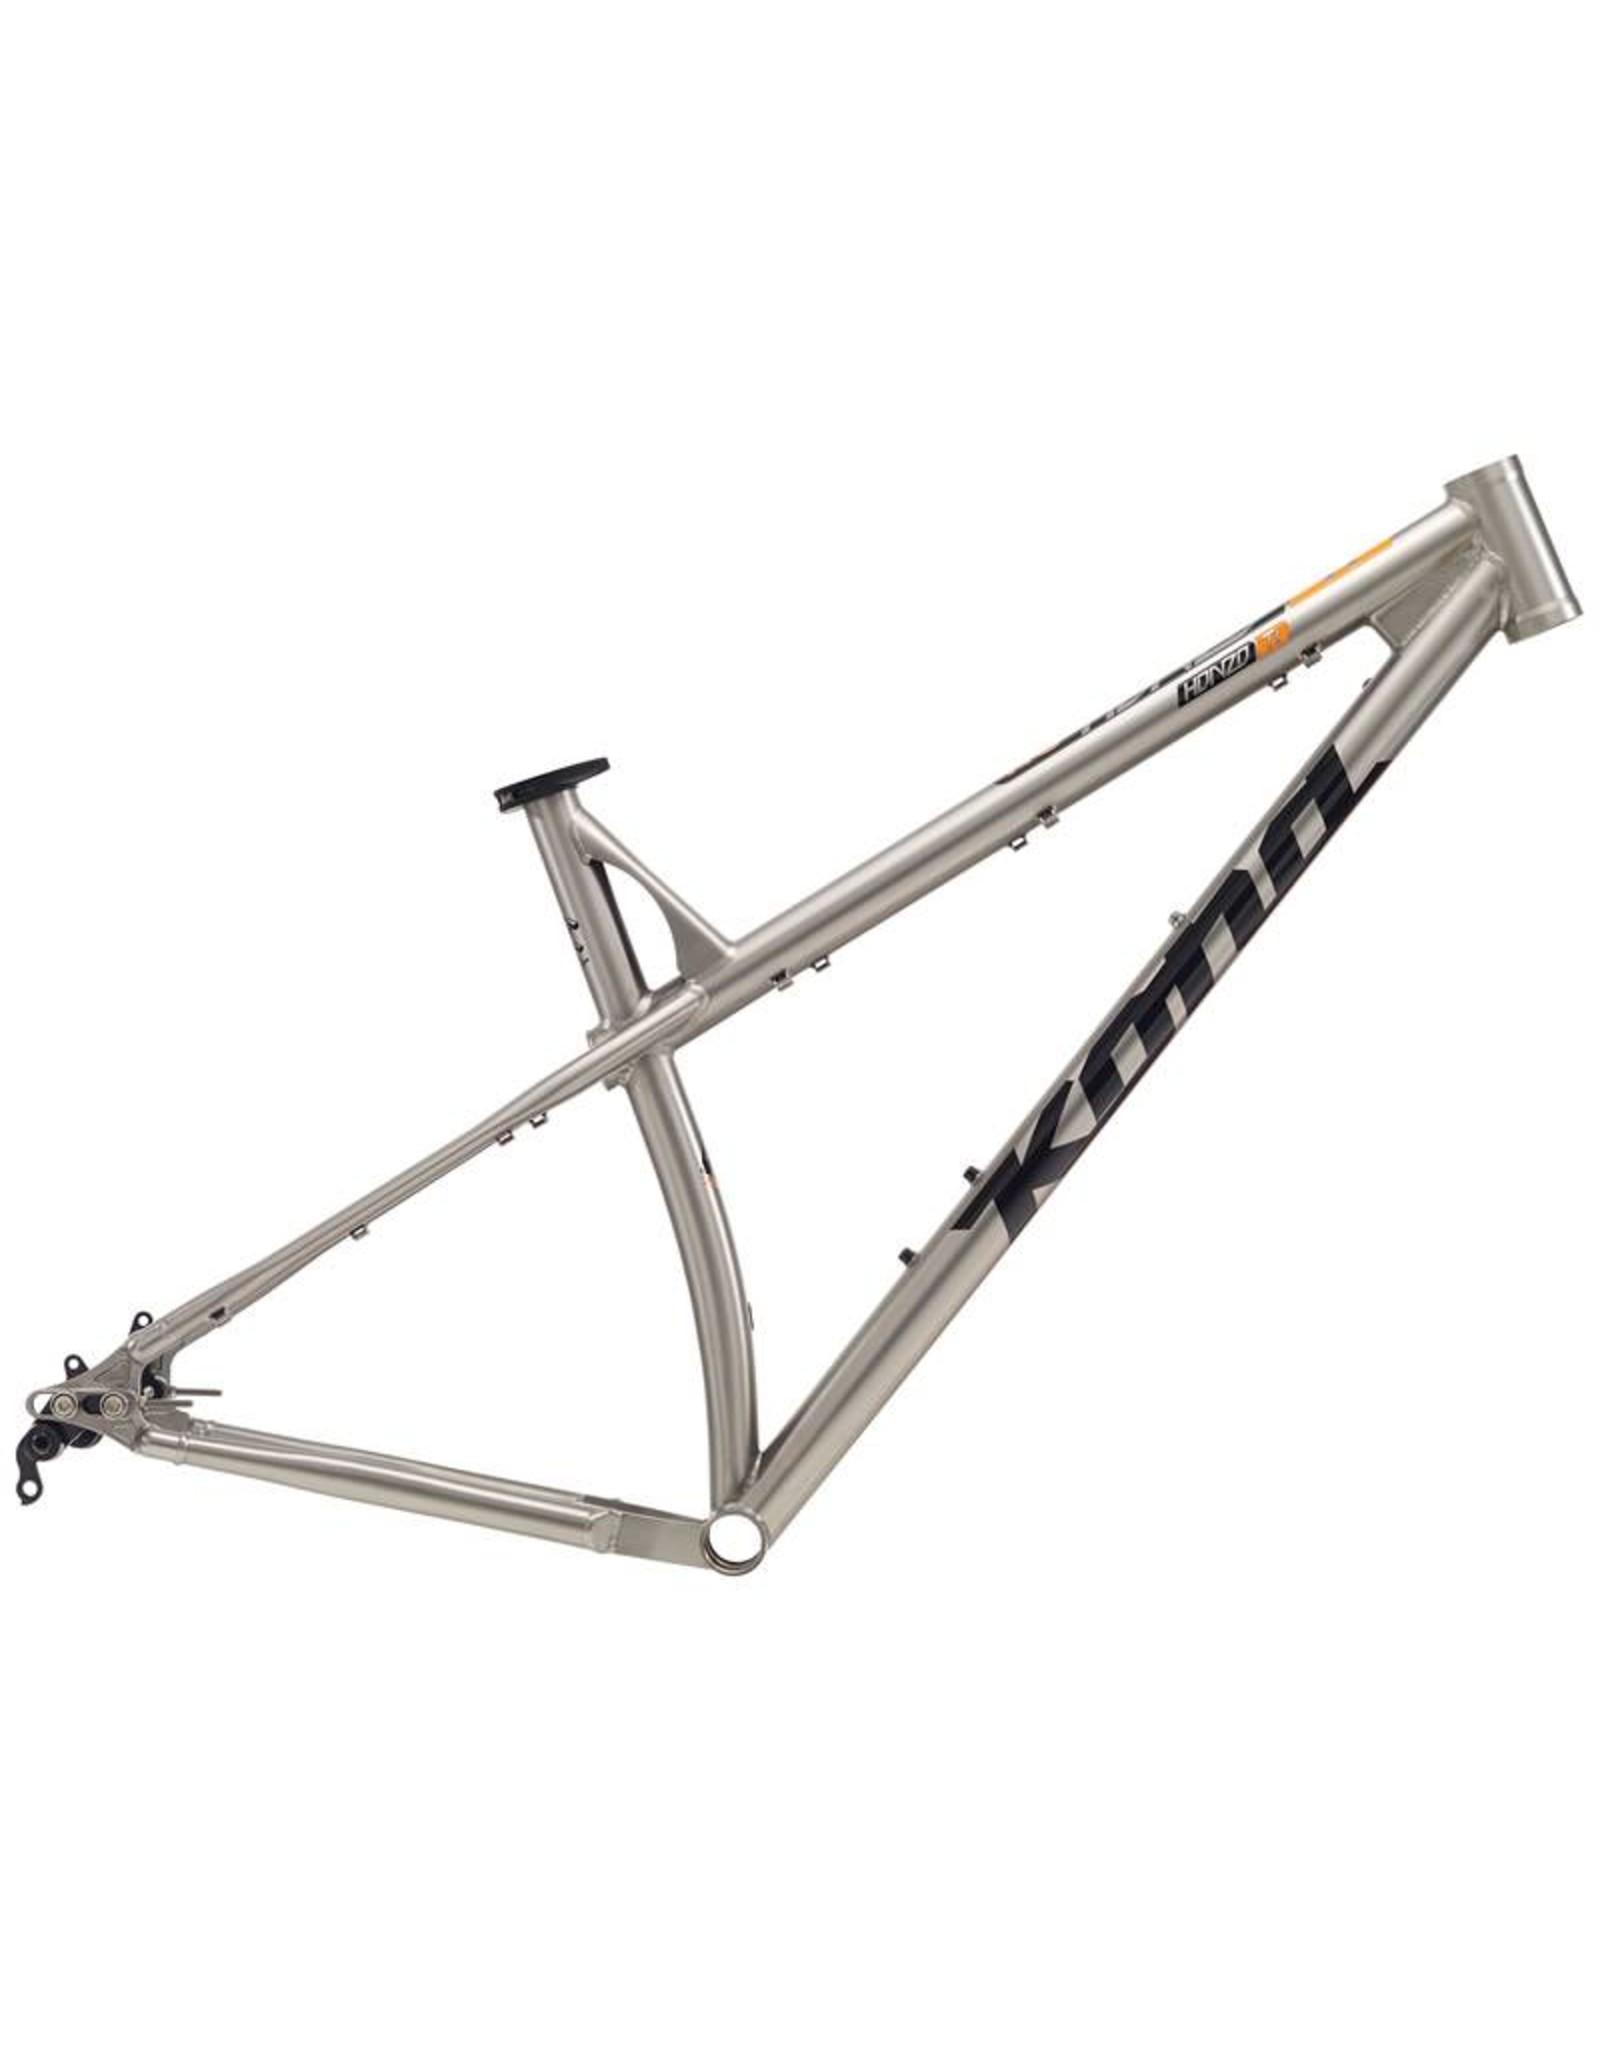 SERVICE Build Bike From Parts/Frame Swap ($89.95/hr)